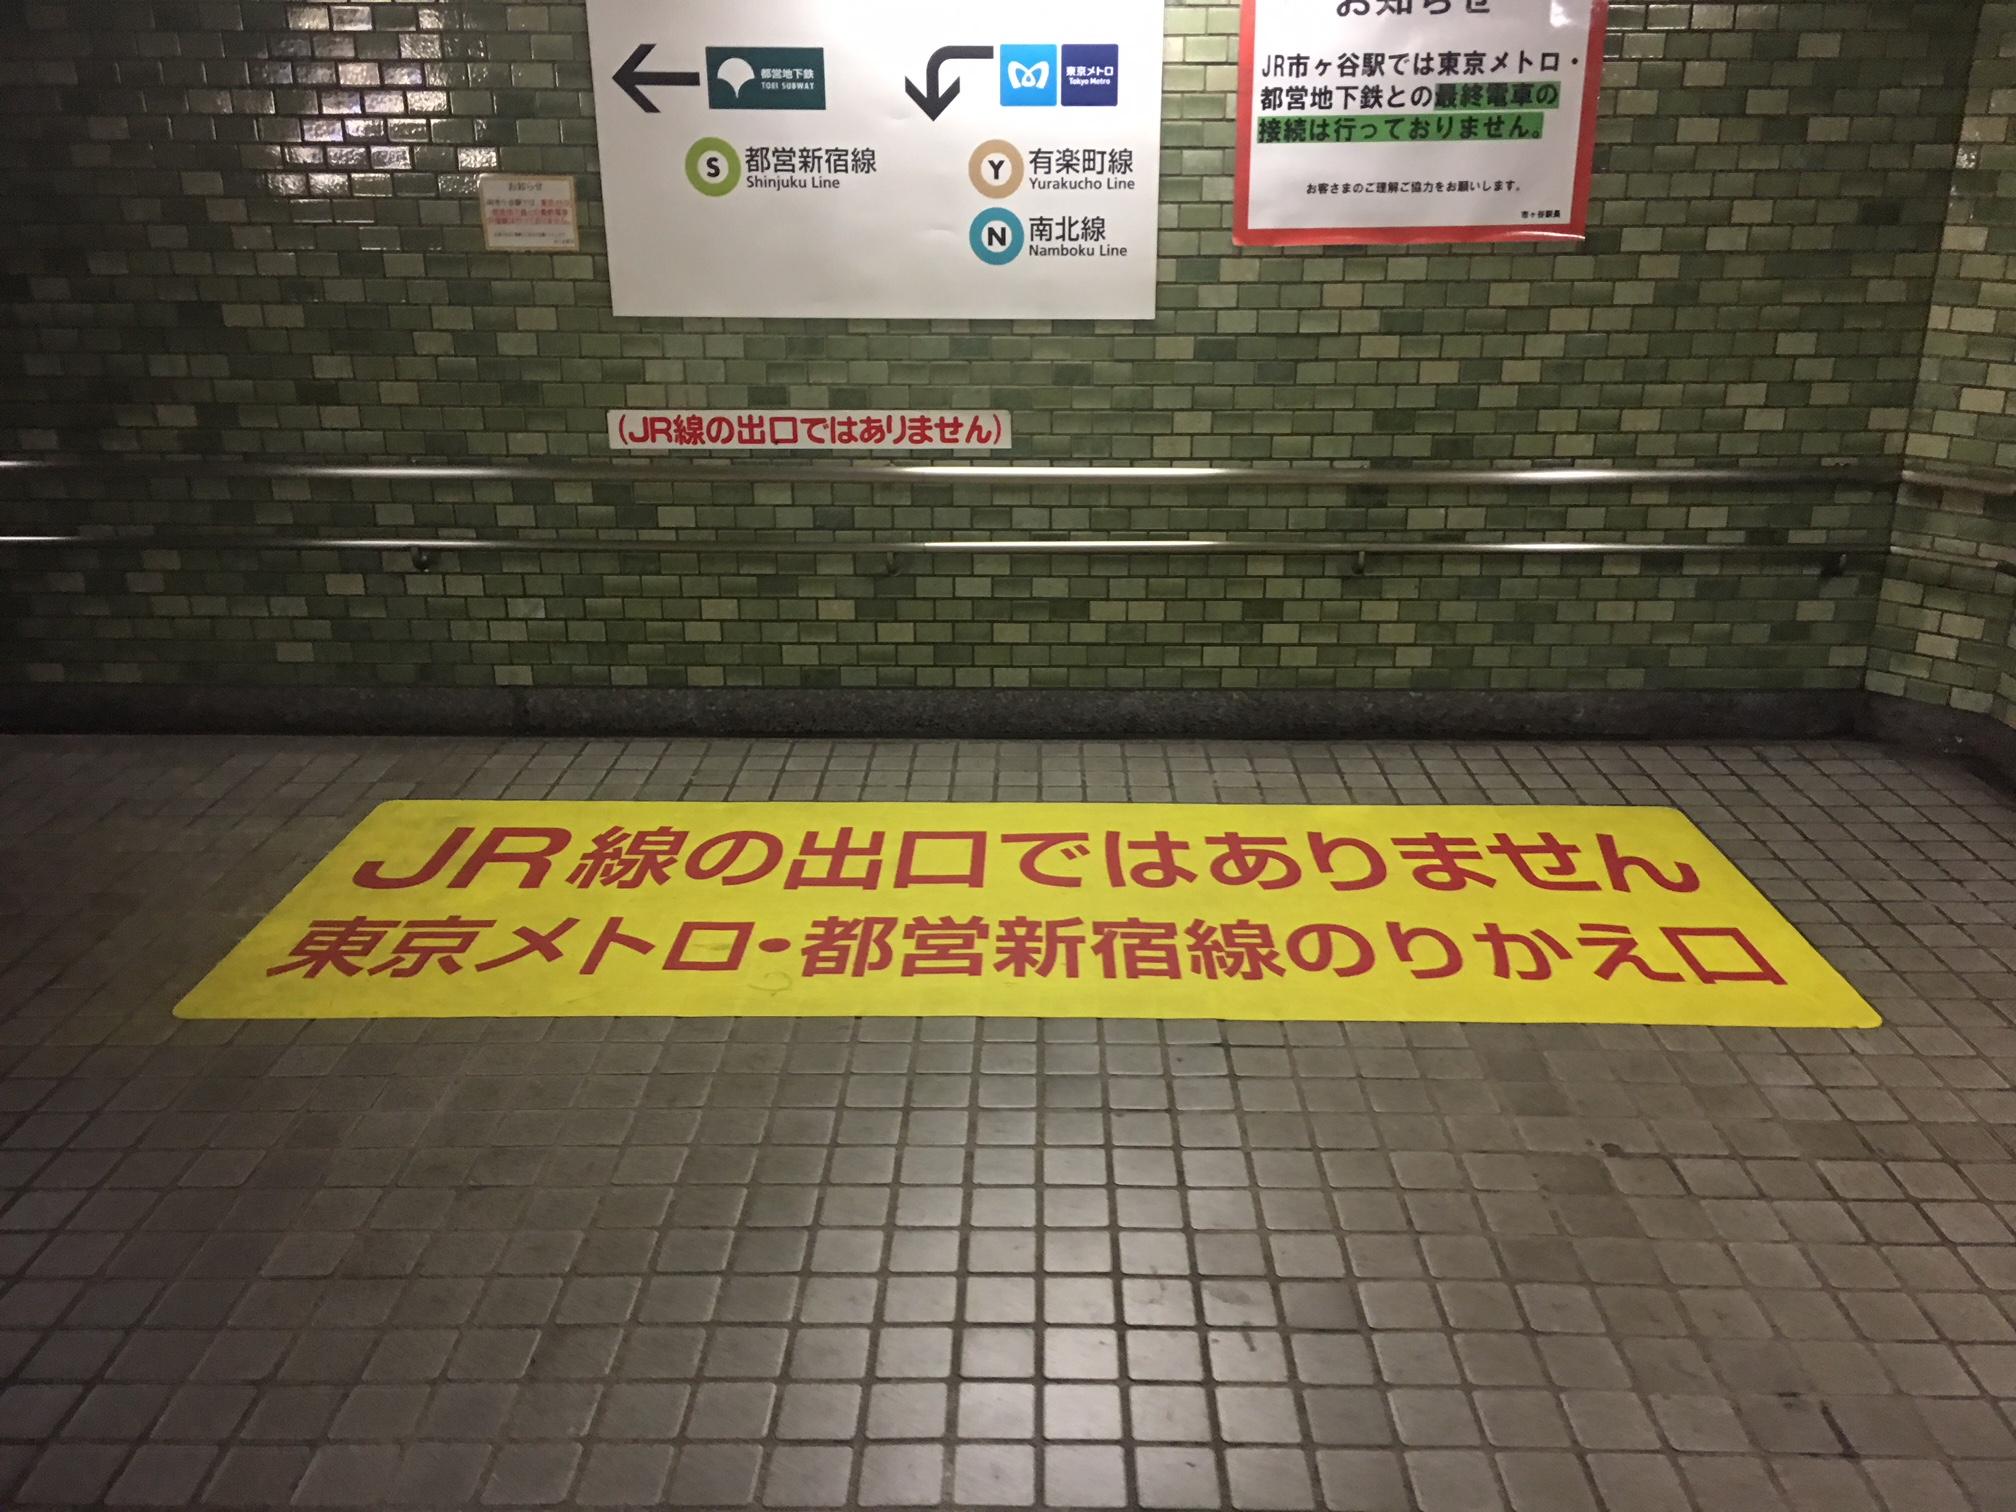 図 市ヶ谷 駅 構内